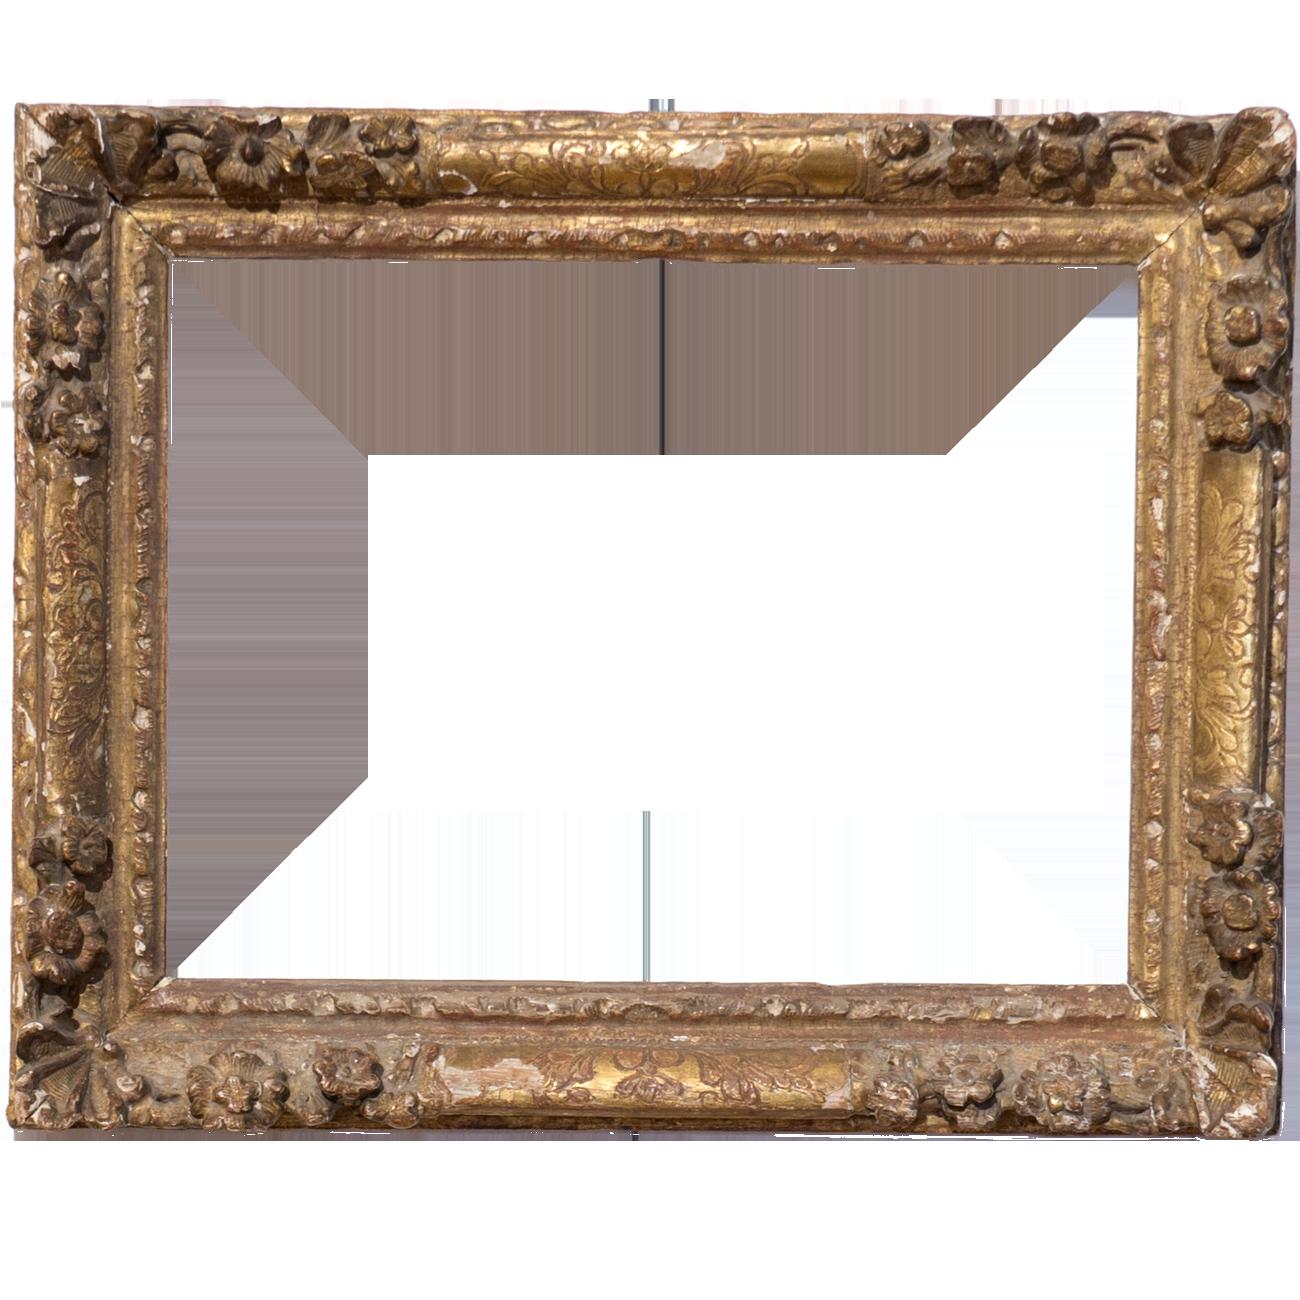 Frames & Colors Tool - Antike Rahmen